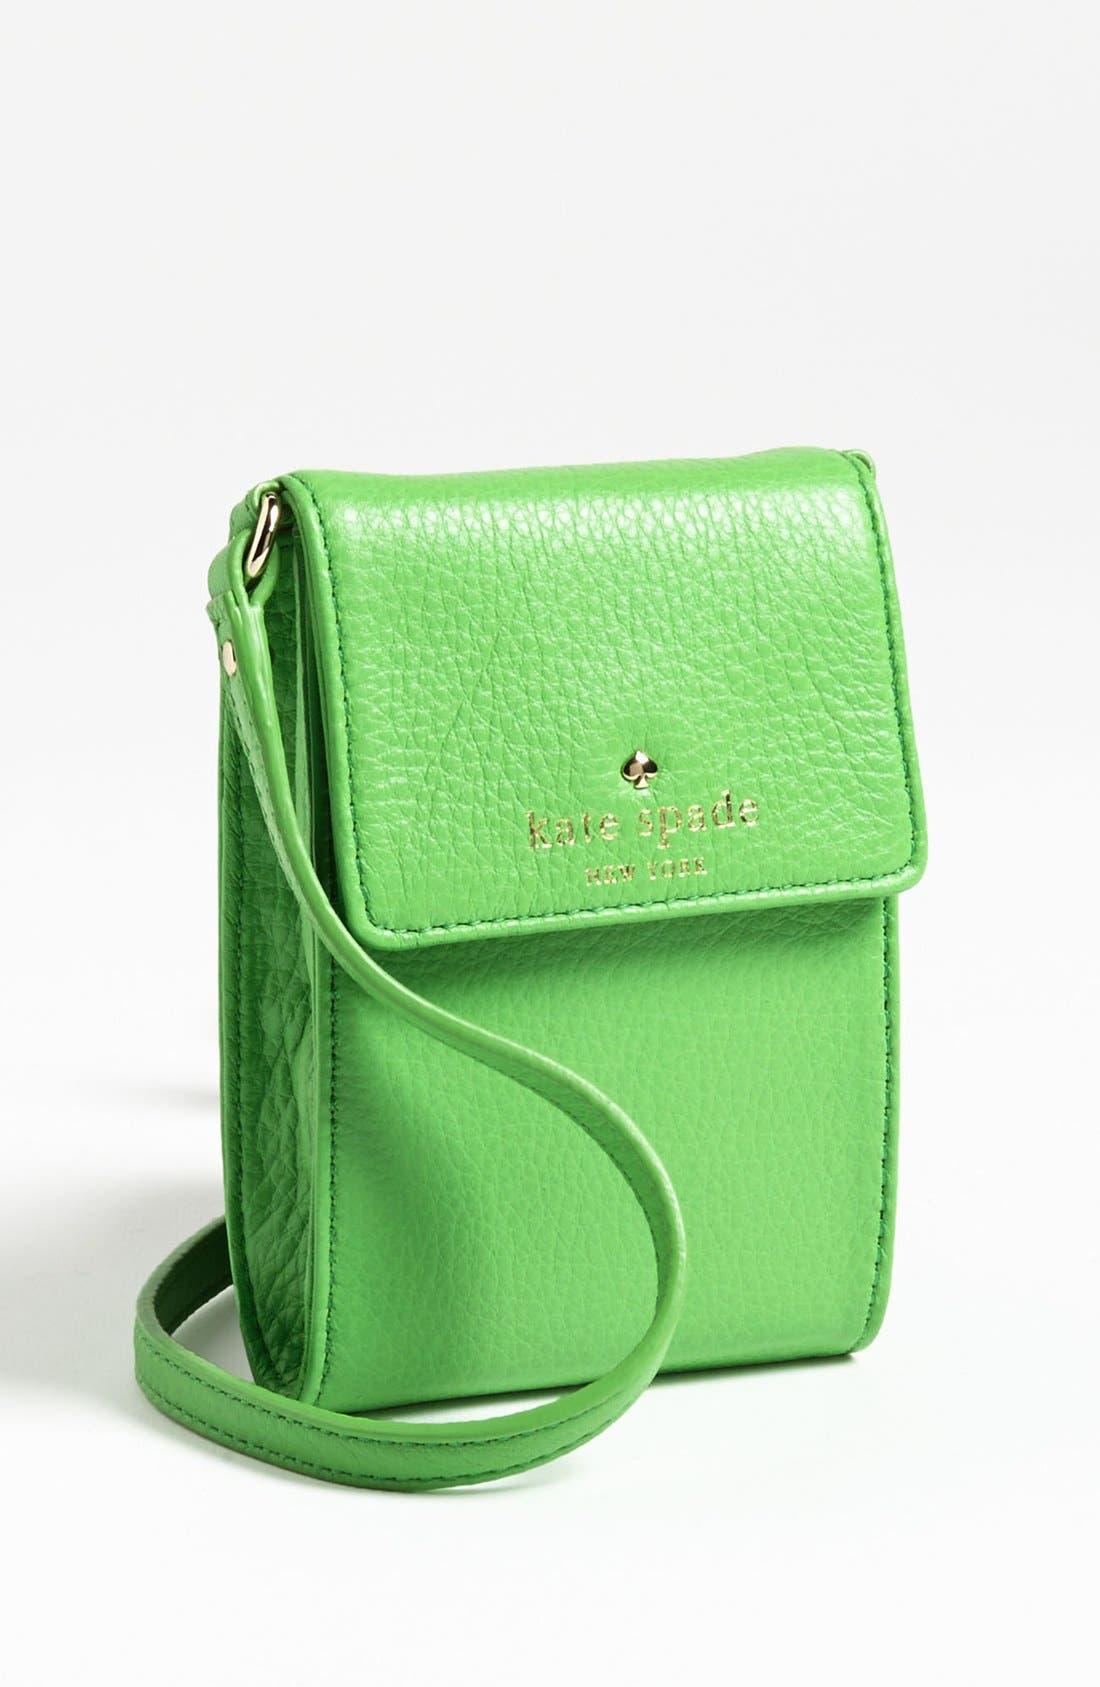 Main Image - kate spade new york 'cobble hill - brandice' crossbody bag